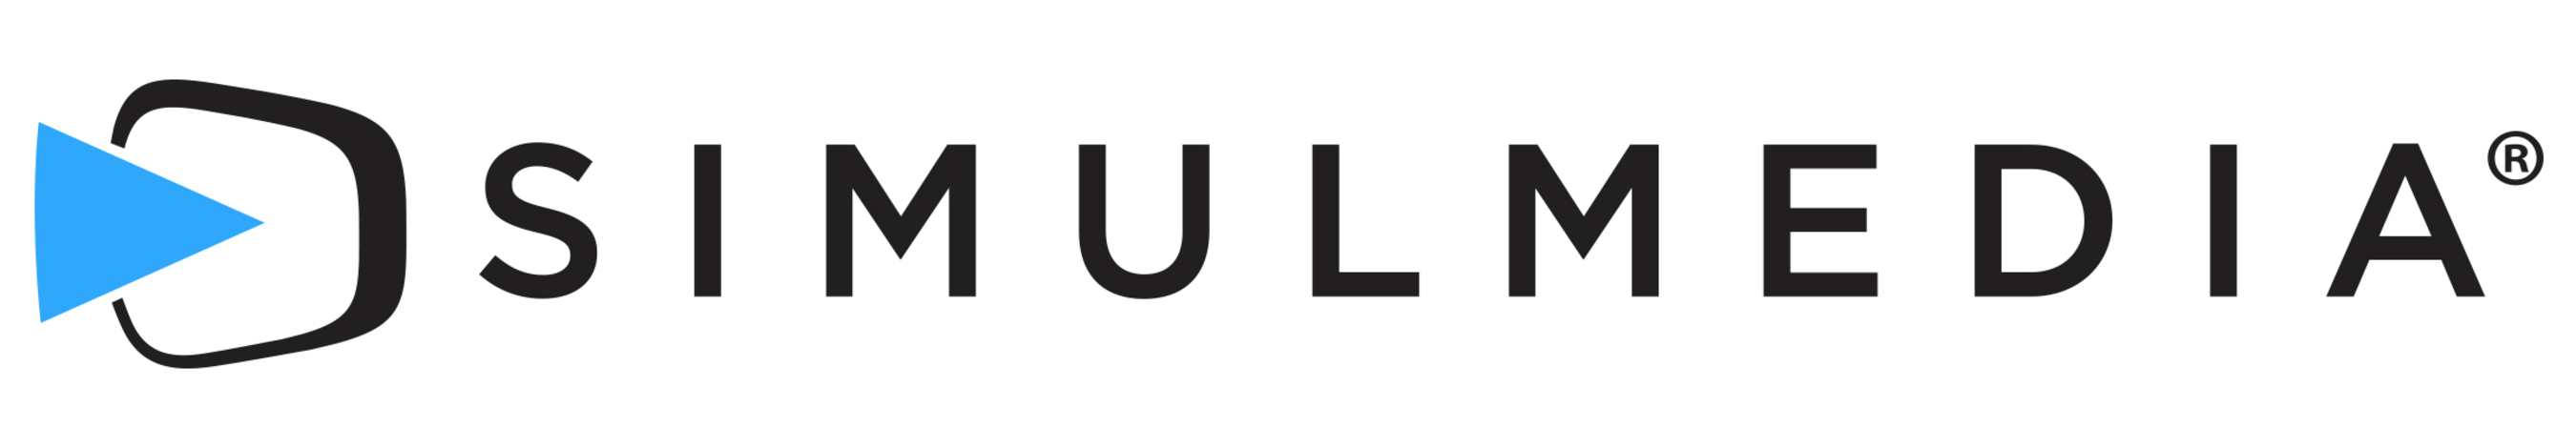 Simulmedia, Inc. ( www.simulmedia.com ) is the leader in helping advertisers and agencies find targeted TV audiences.